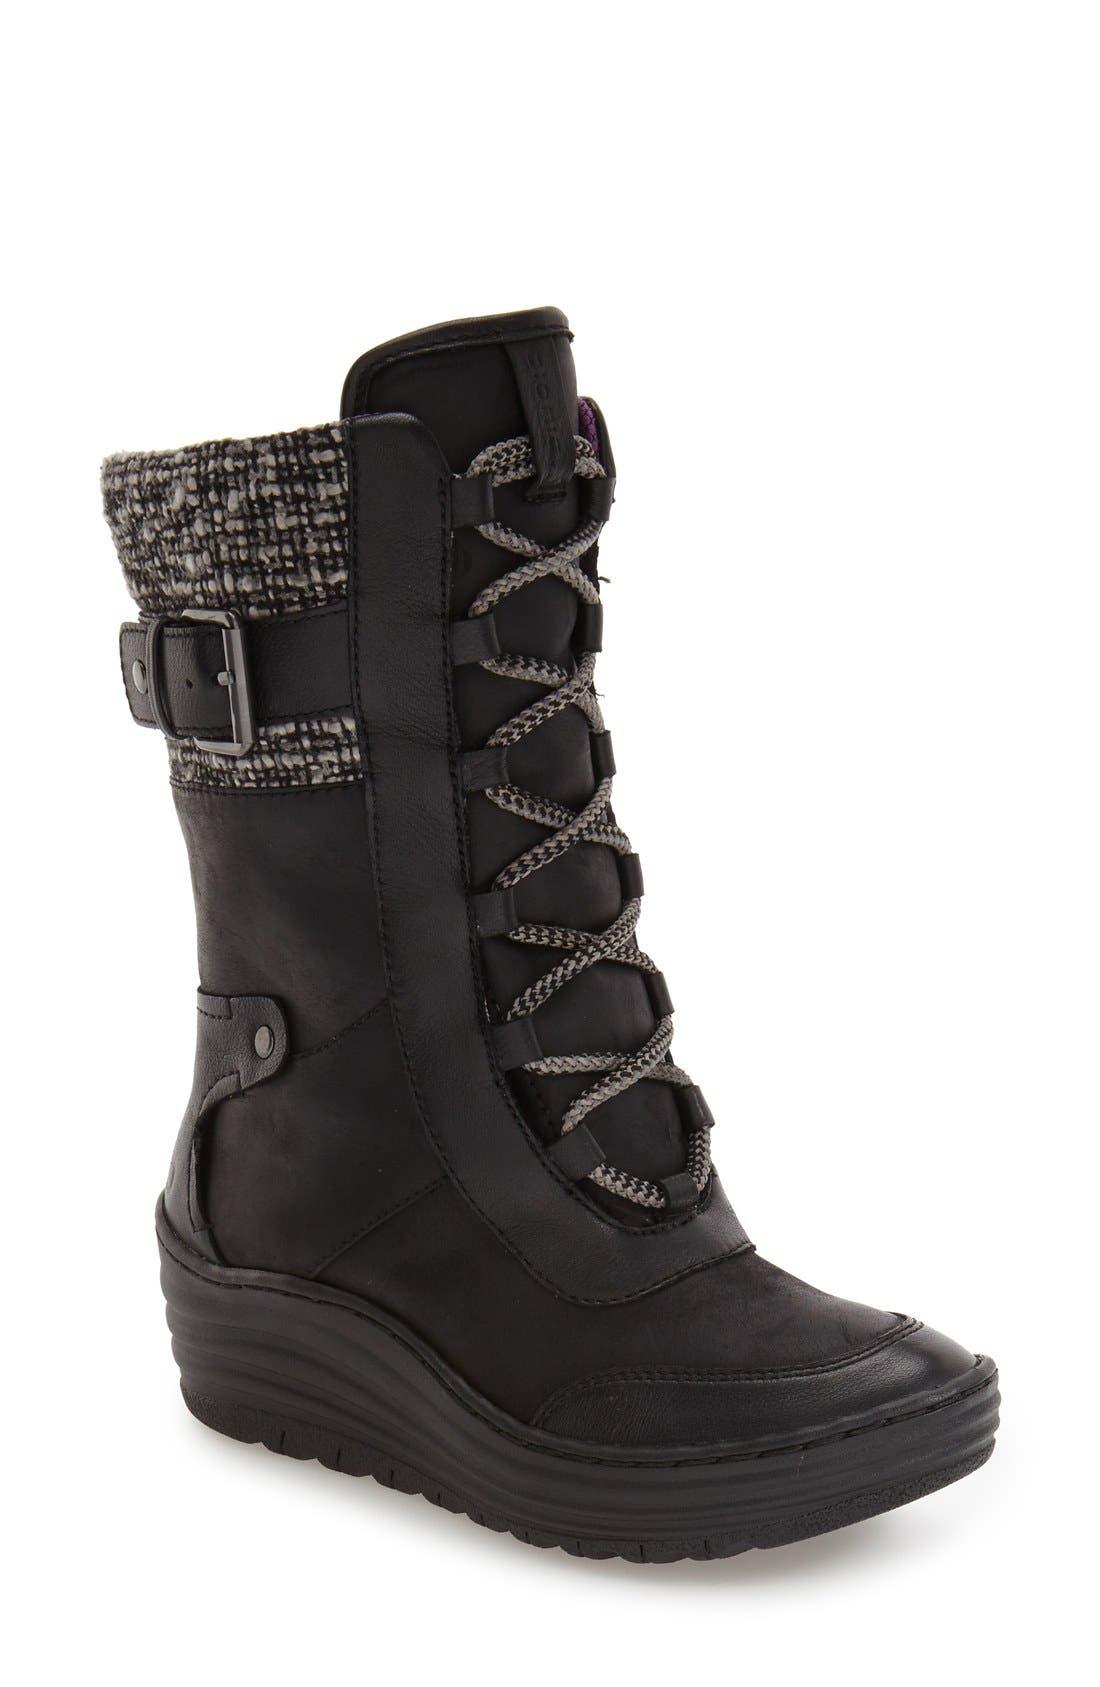 Garland Waterproof Wedge Boot,                         Main,                         color, 001